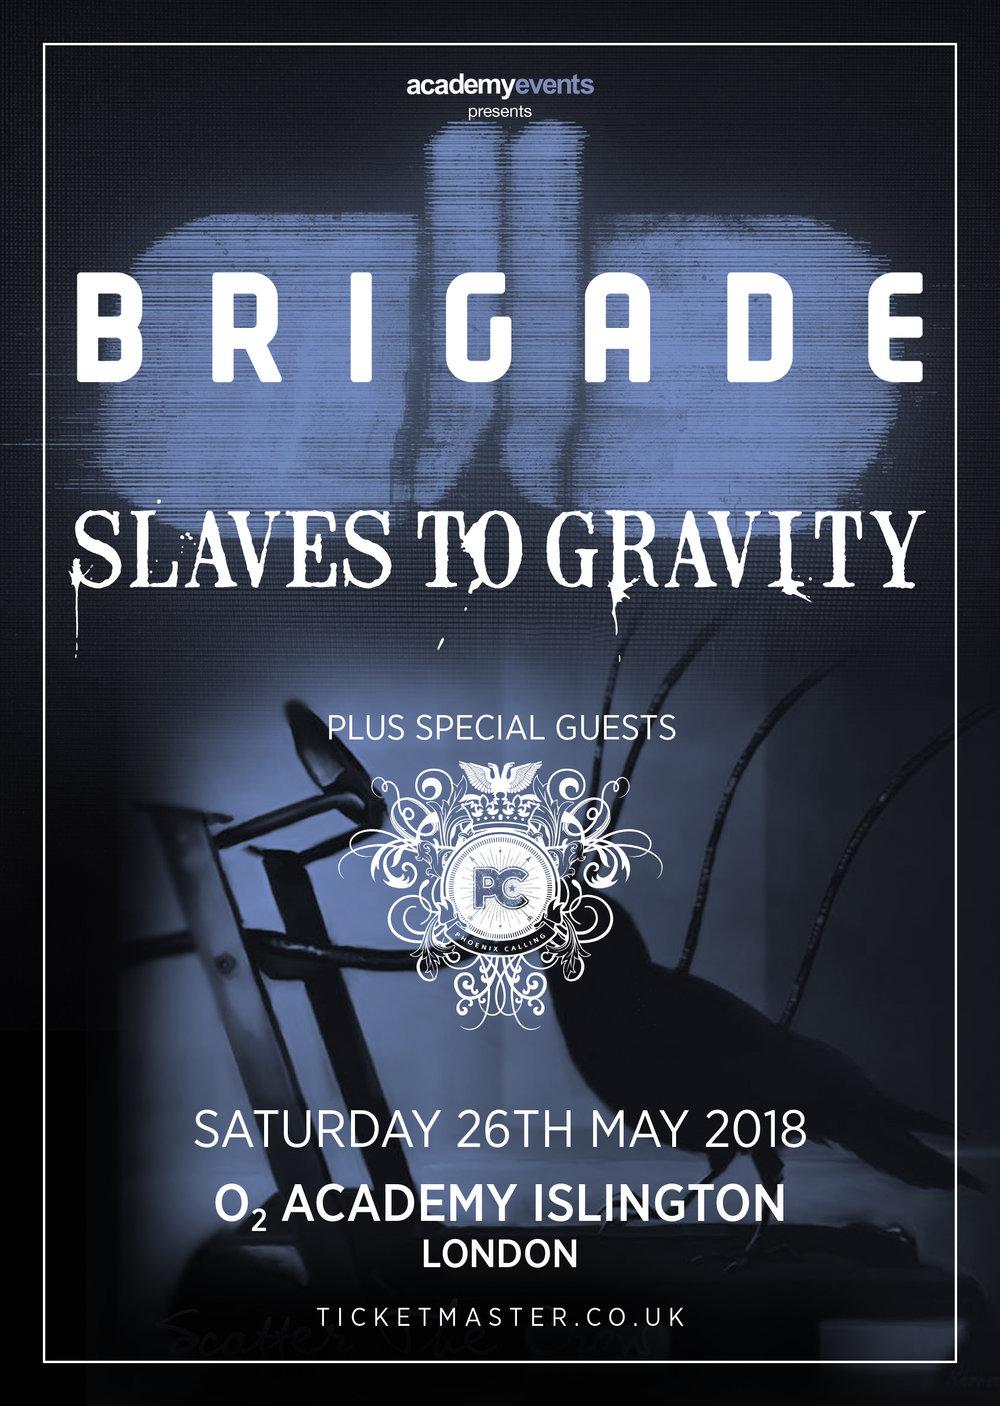 Brigade-STG-2018-A3-London-poster.jpg